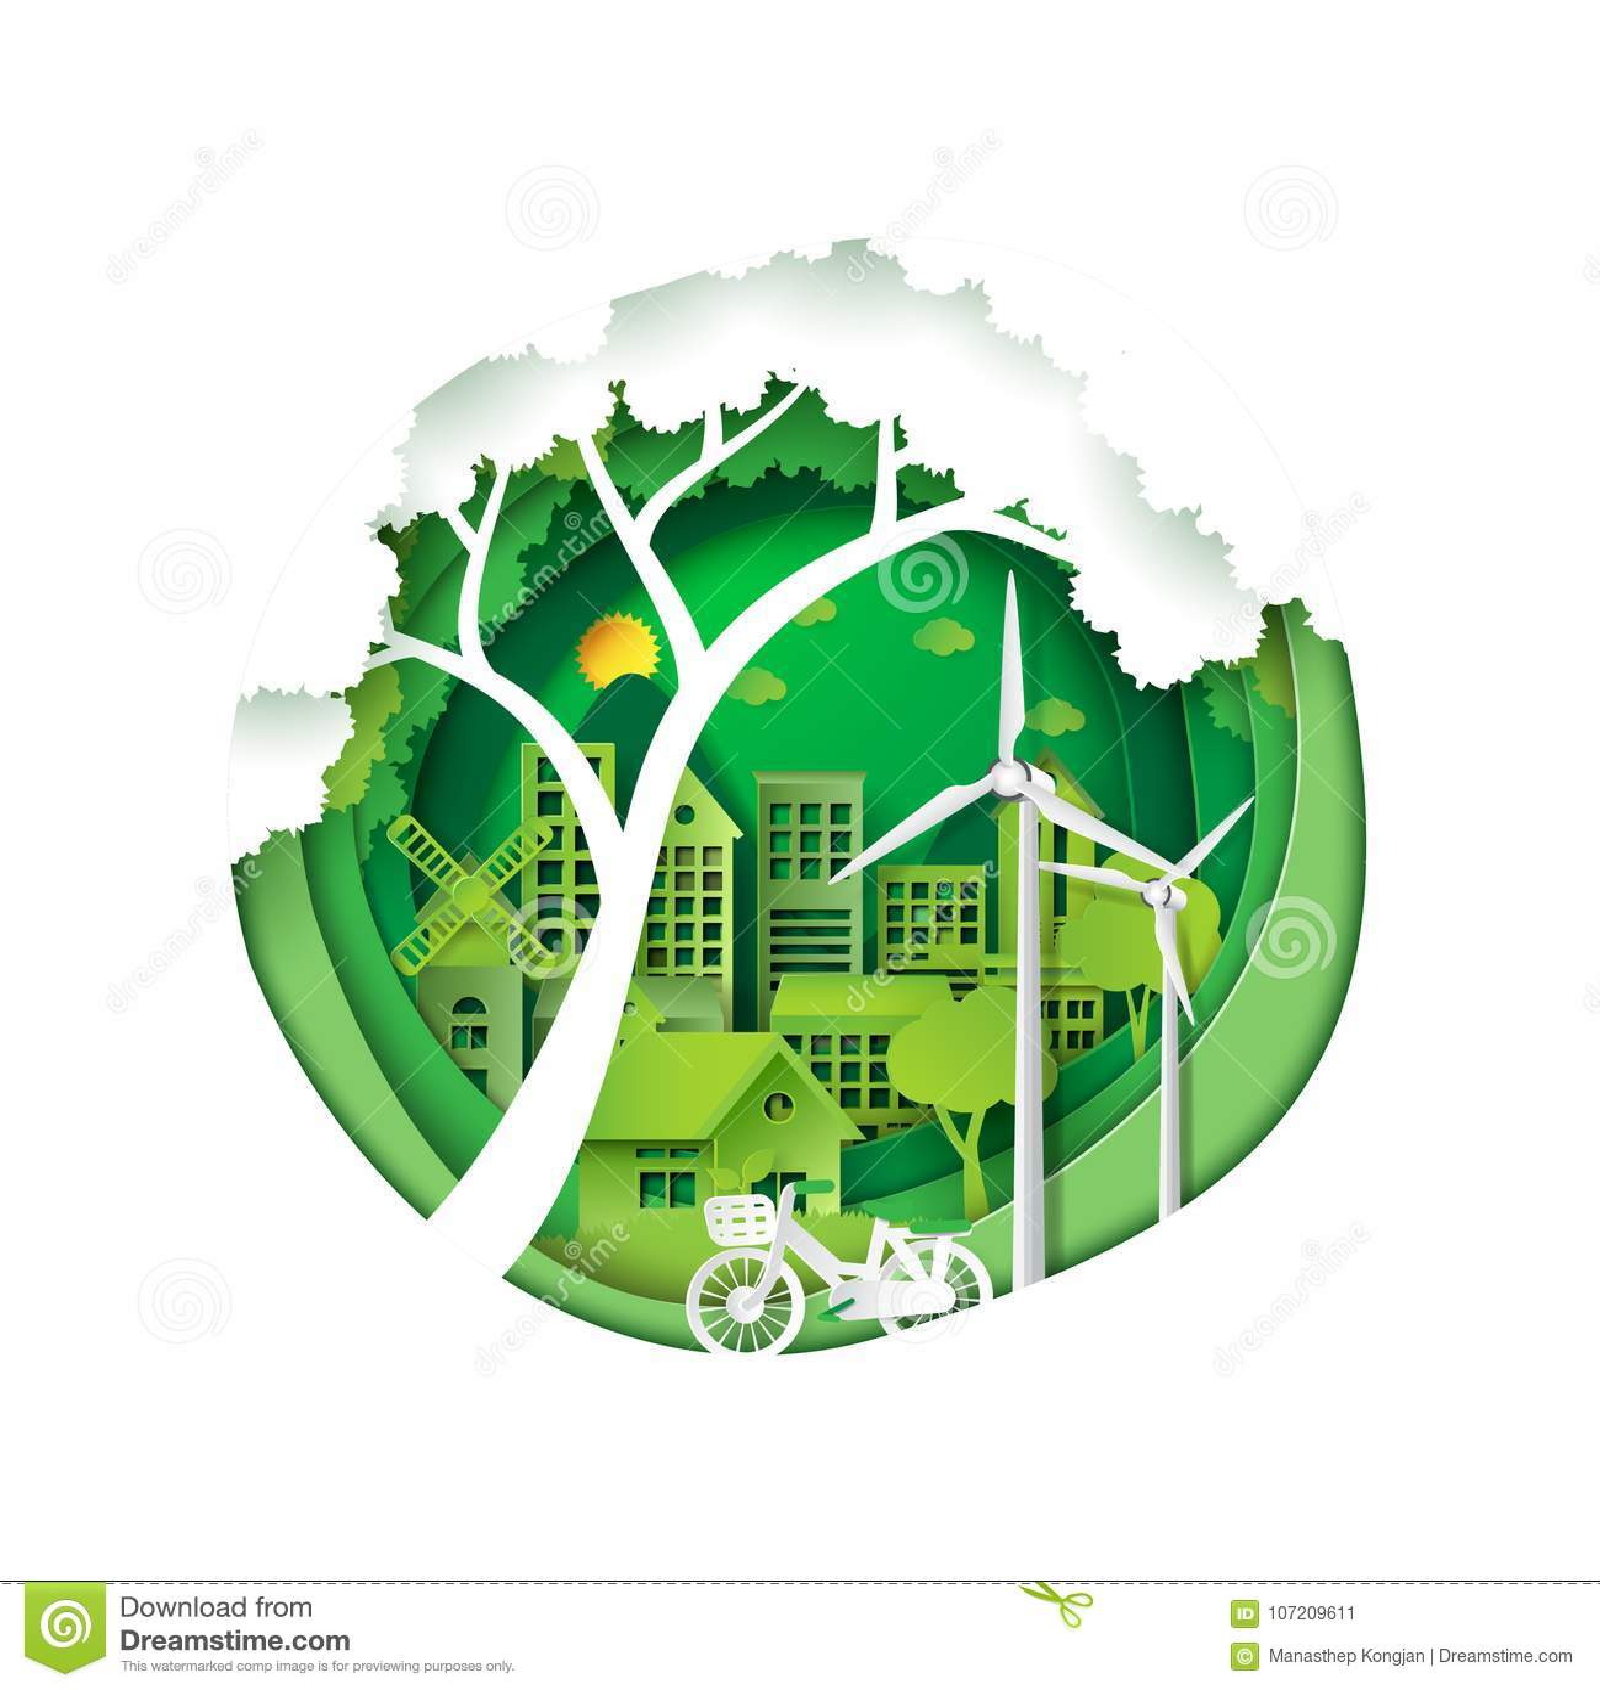 Environmental Concept Earthfriendly Landscapes: Green City For Environment Conservation Stock Vector